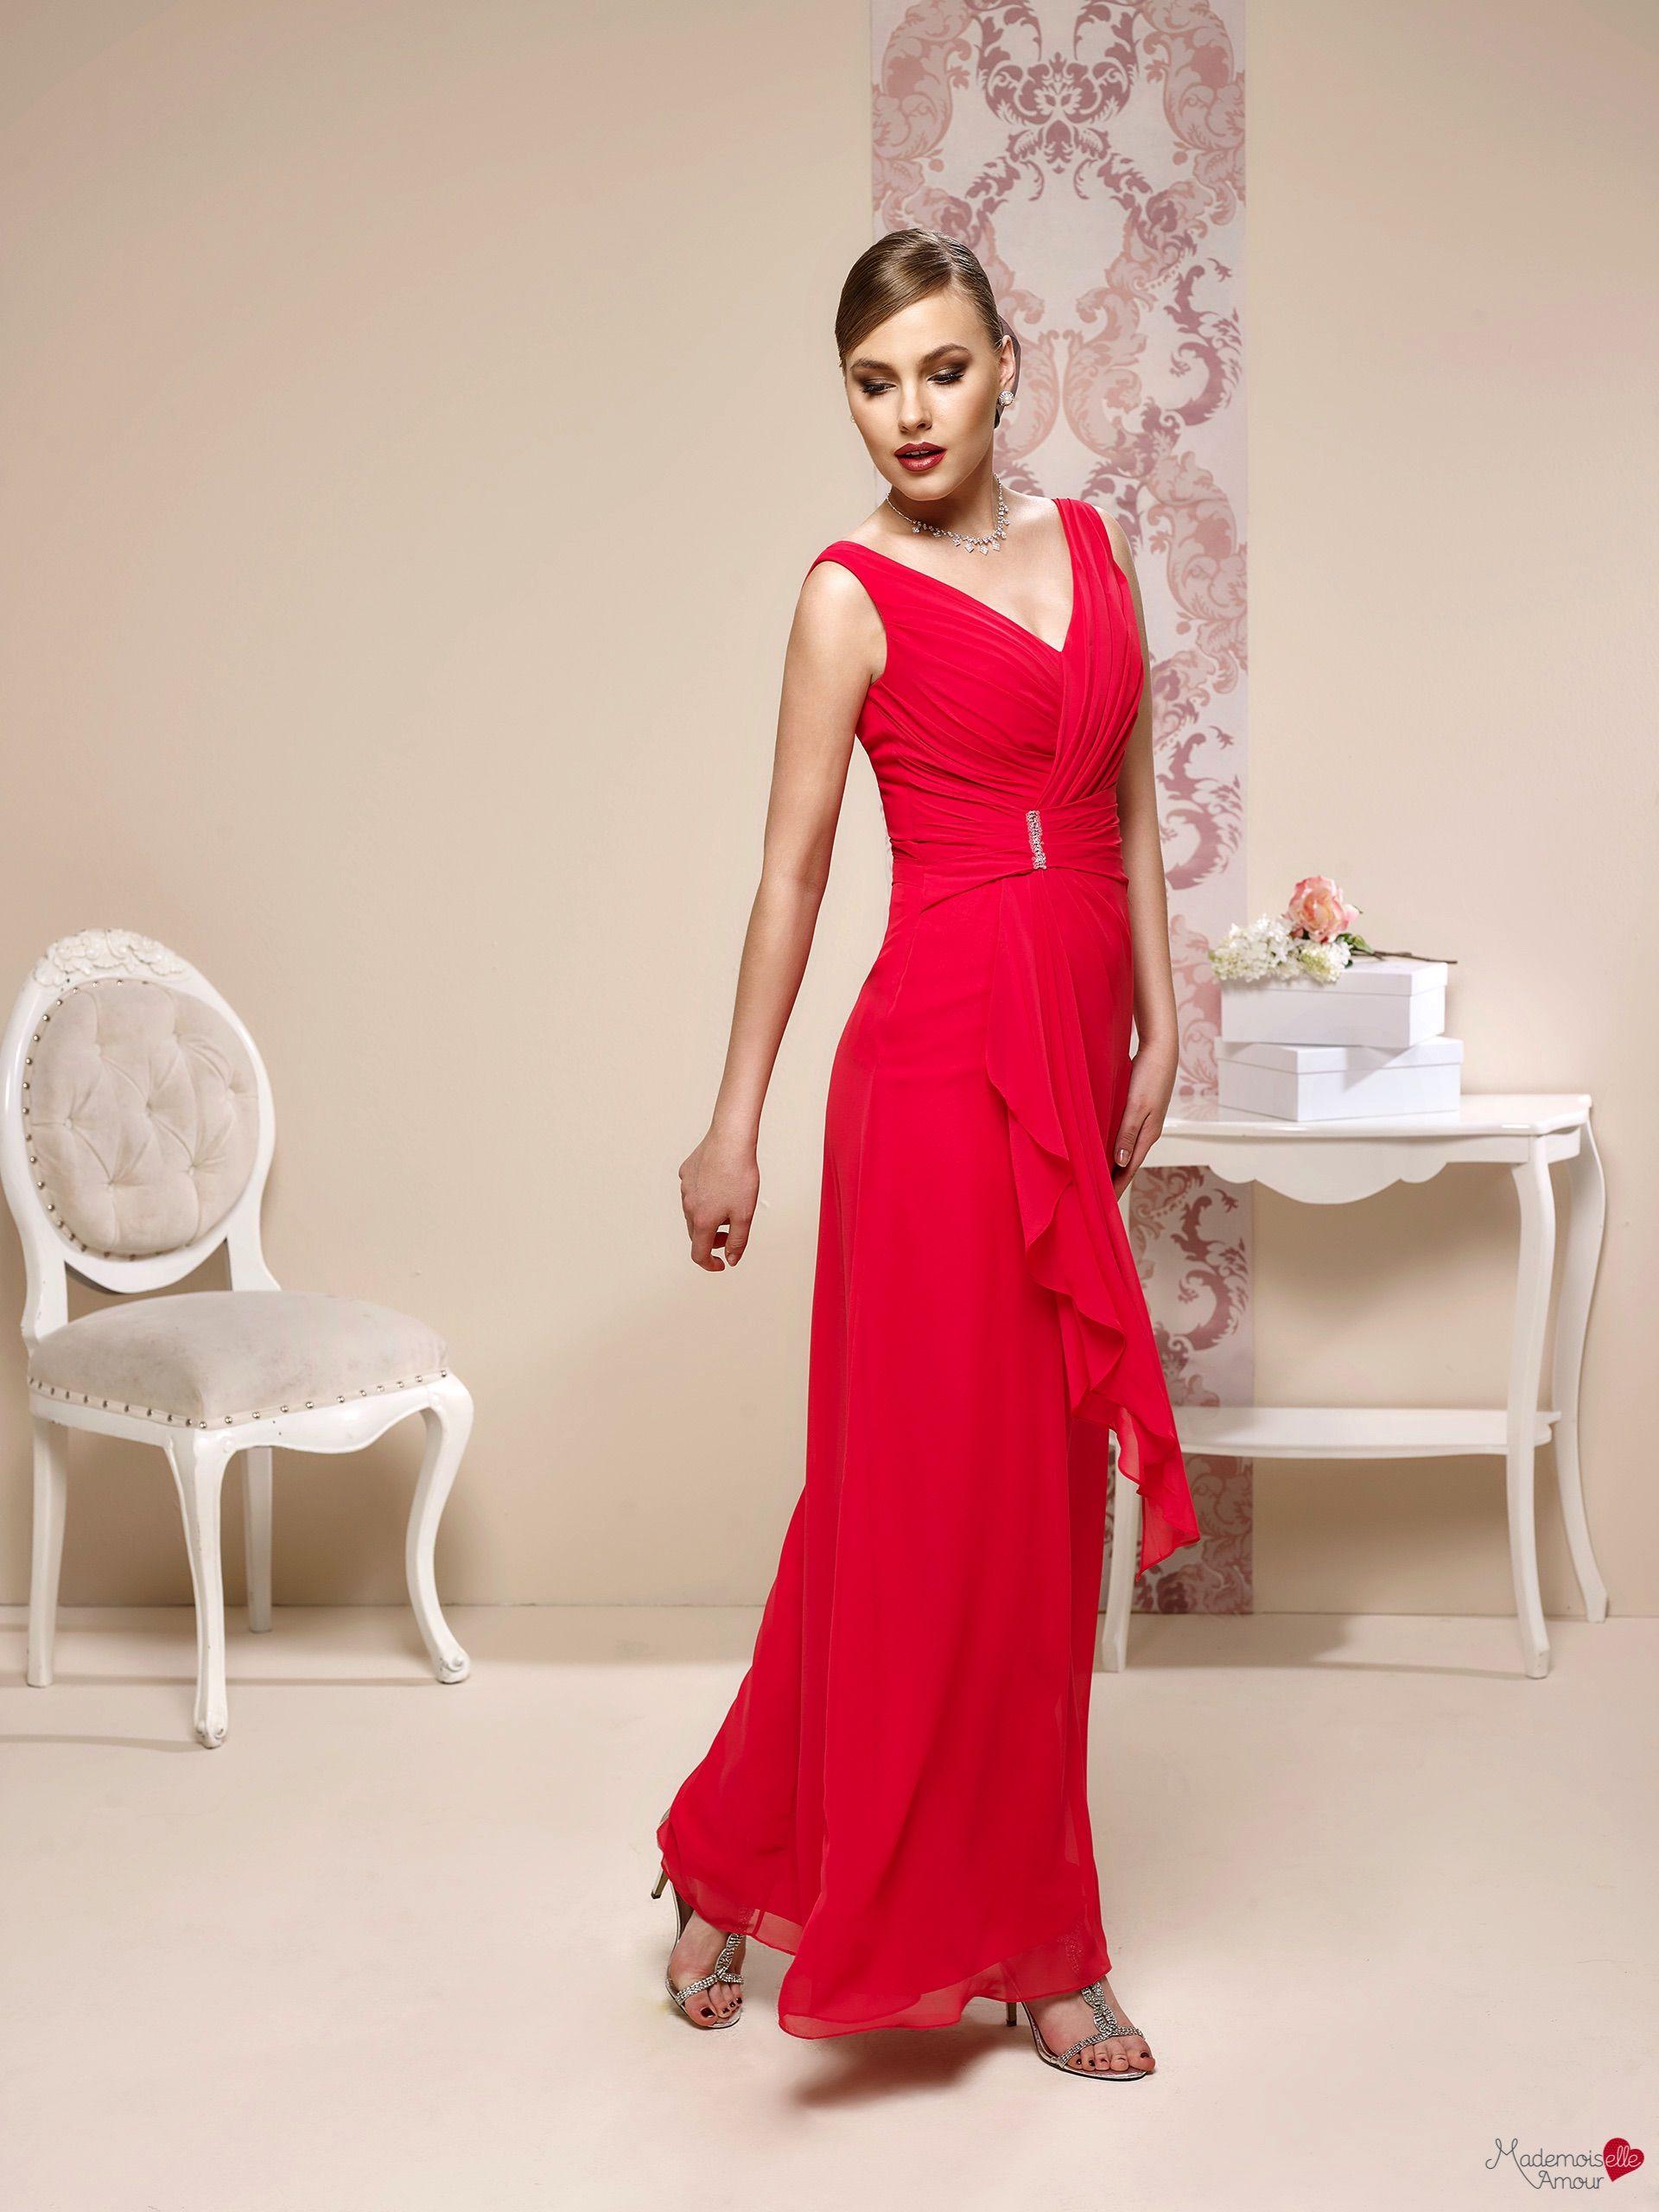 robes de cocktail mademoiselle amour mod le londres http. Black Bedroom Furniture Sets. Home Design Ideas